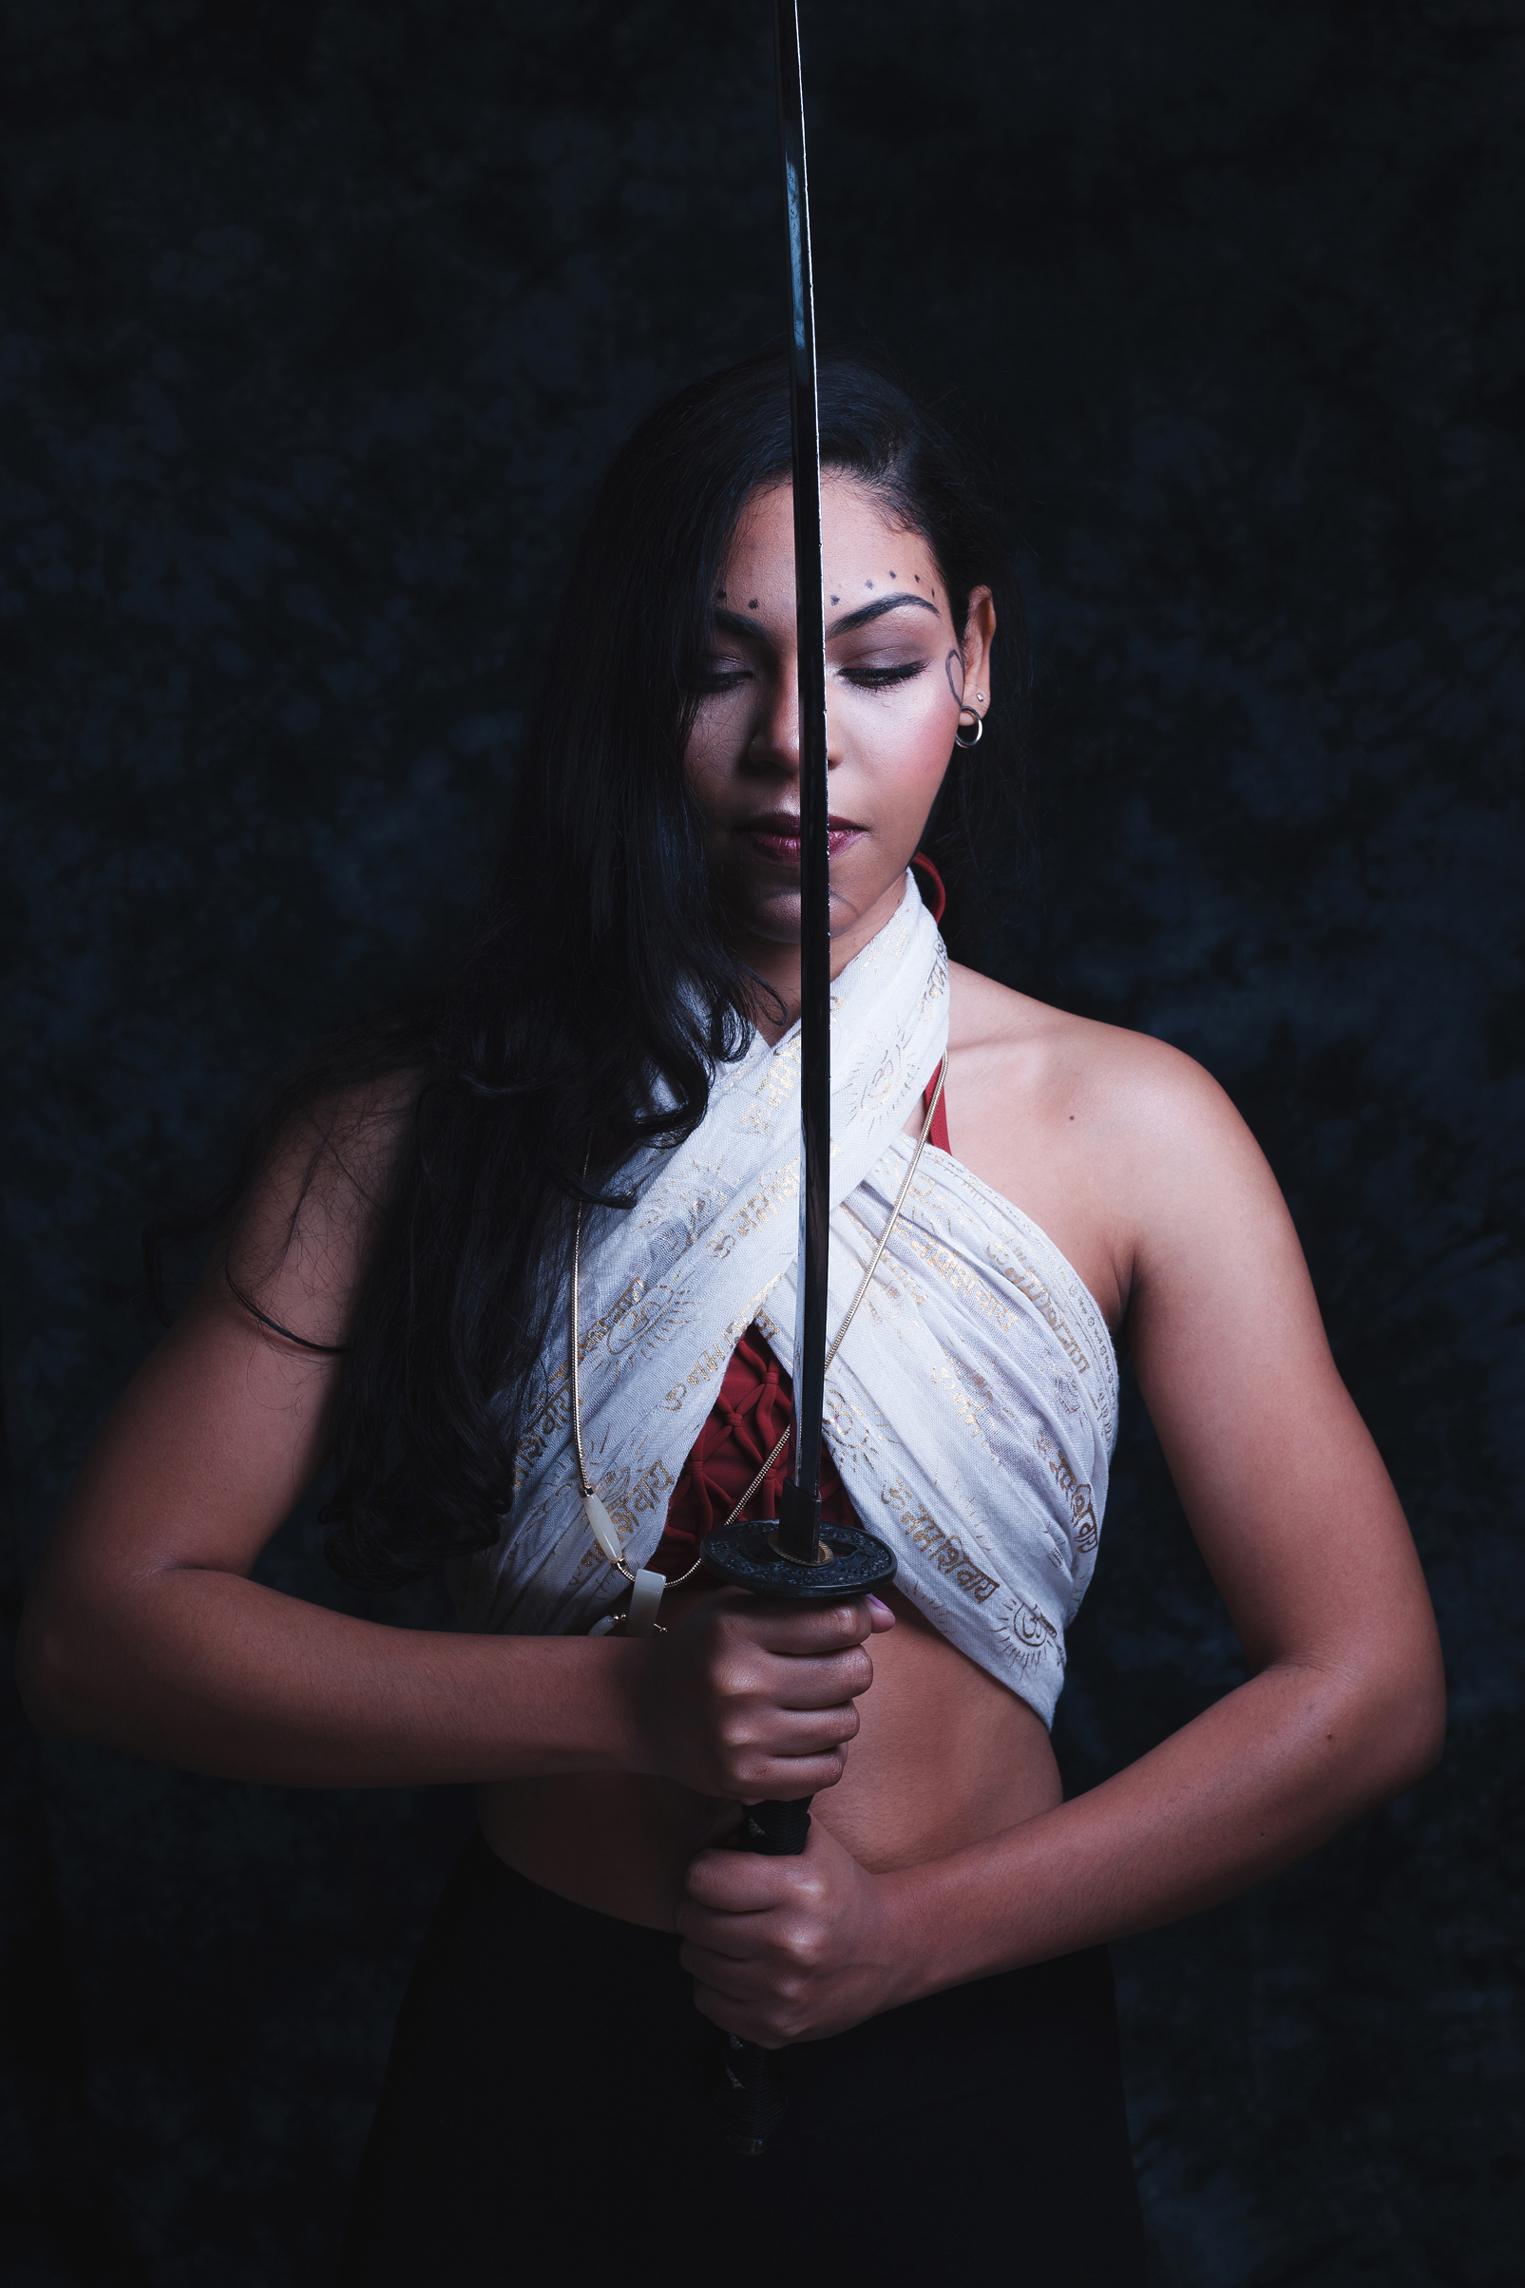 lady-warrior-with-katana.jpg